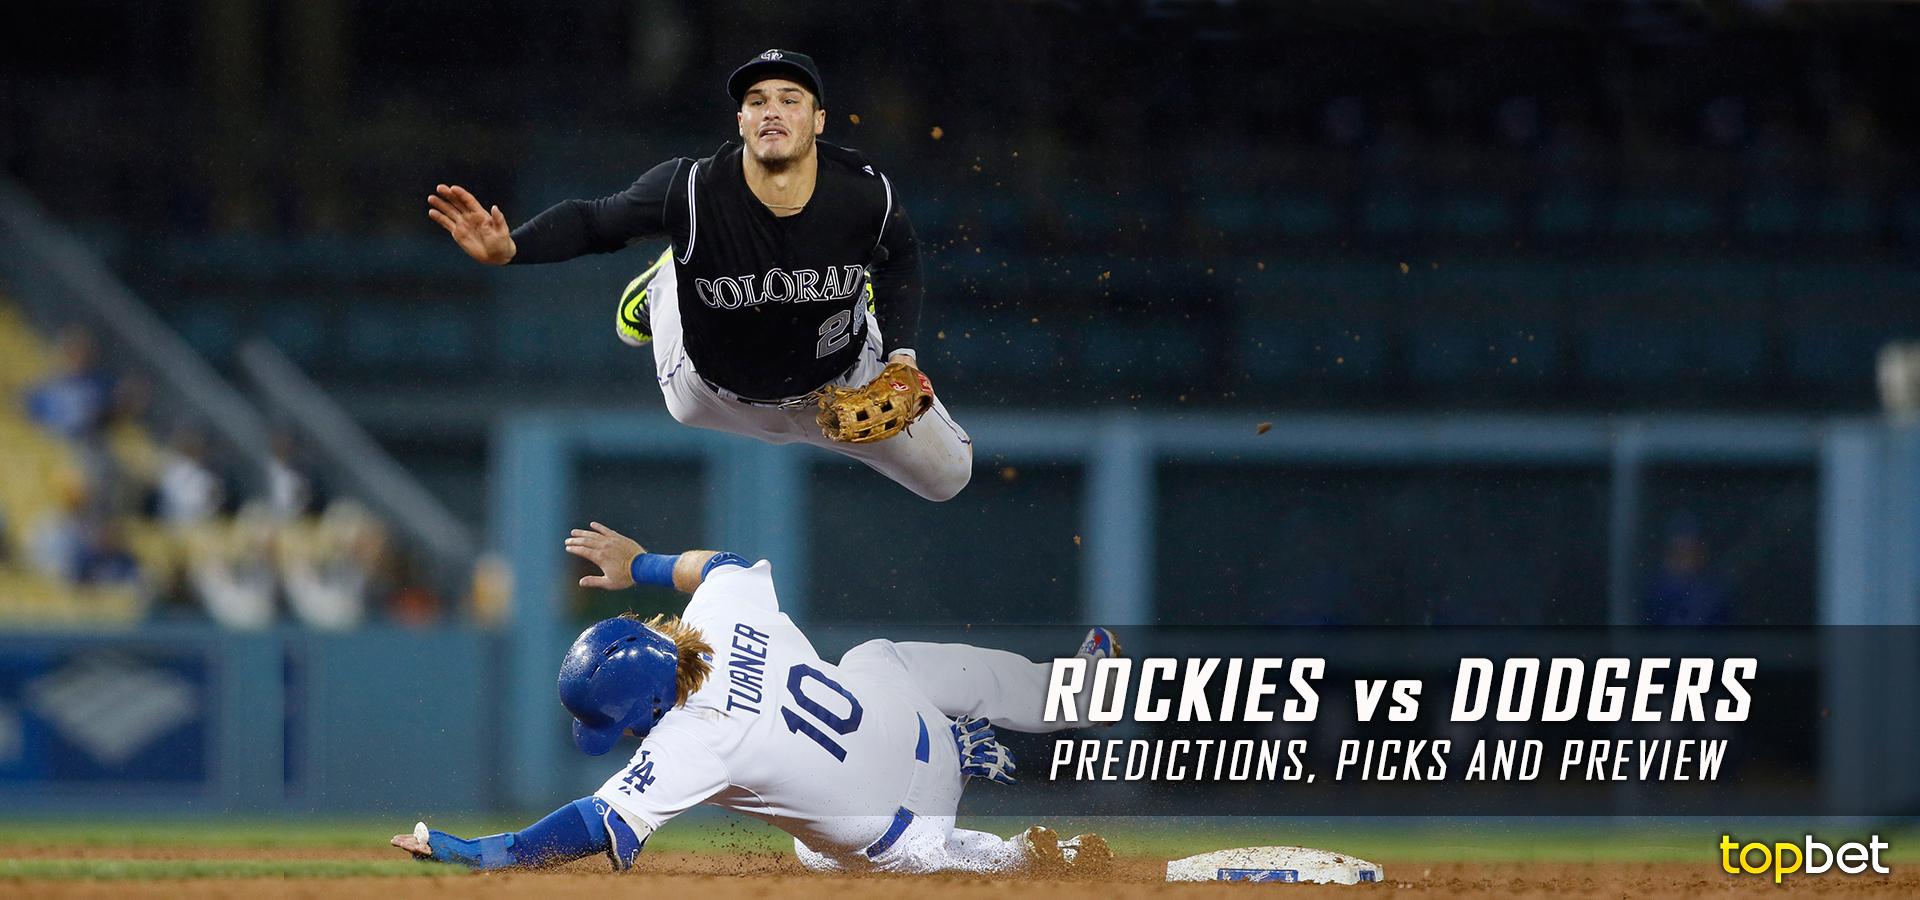 Image Result For Rockies Vs Dodgers